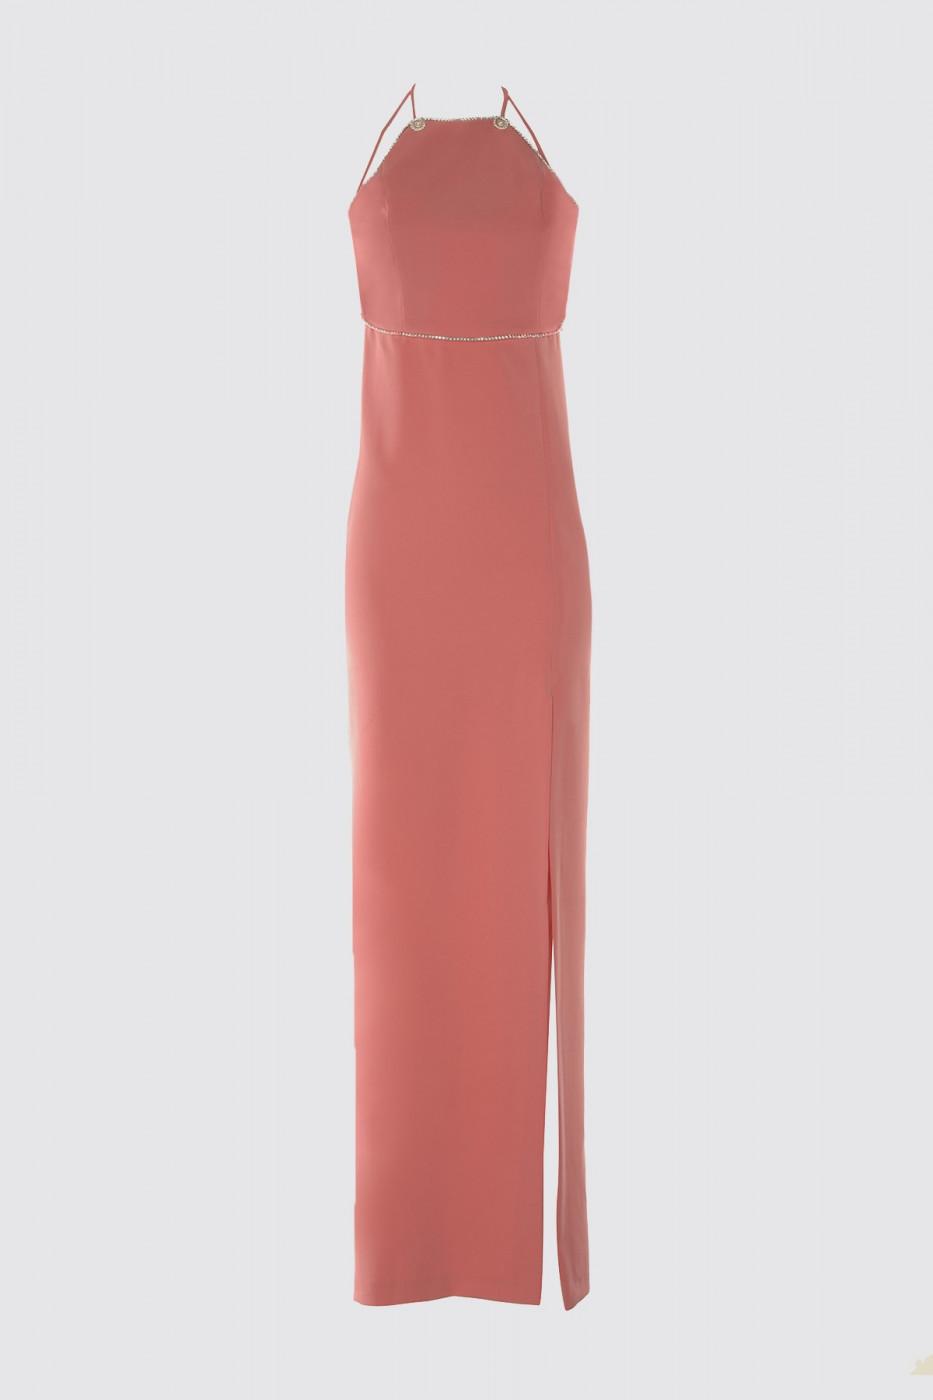 Trendyol Evening Dress & Graduation Dress with Pink Stone Accessory